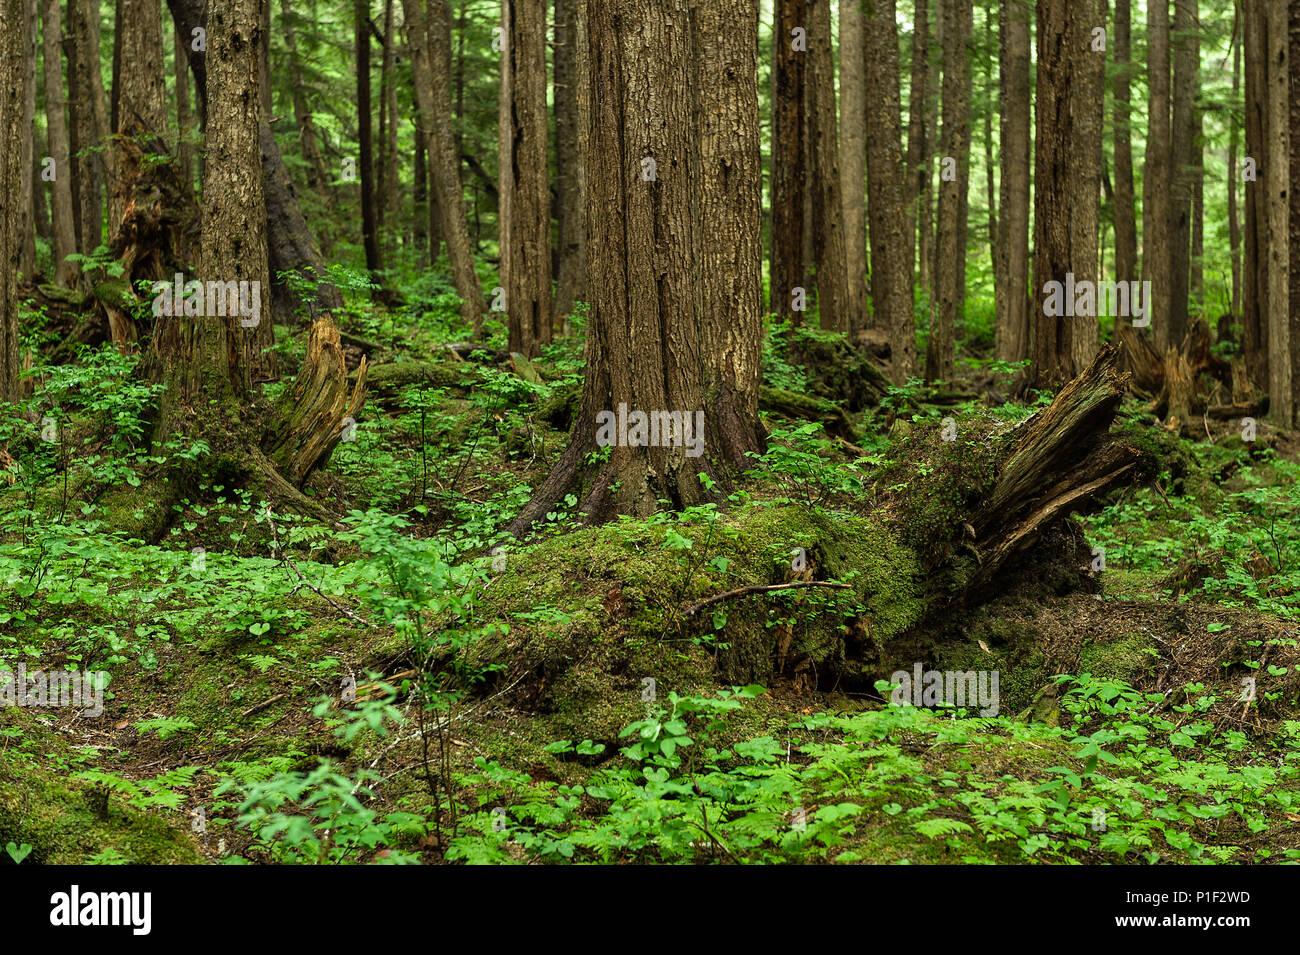 Verde foresta floor, Canarie punto, Hoonah, Alaska, Stati Uniti d'America. Immagini Stock